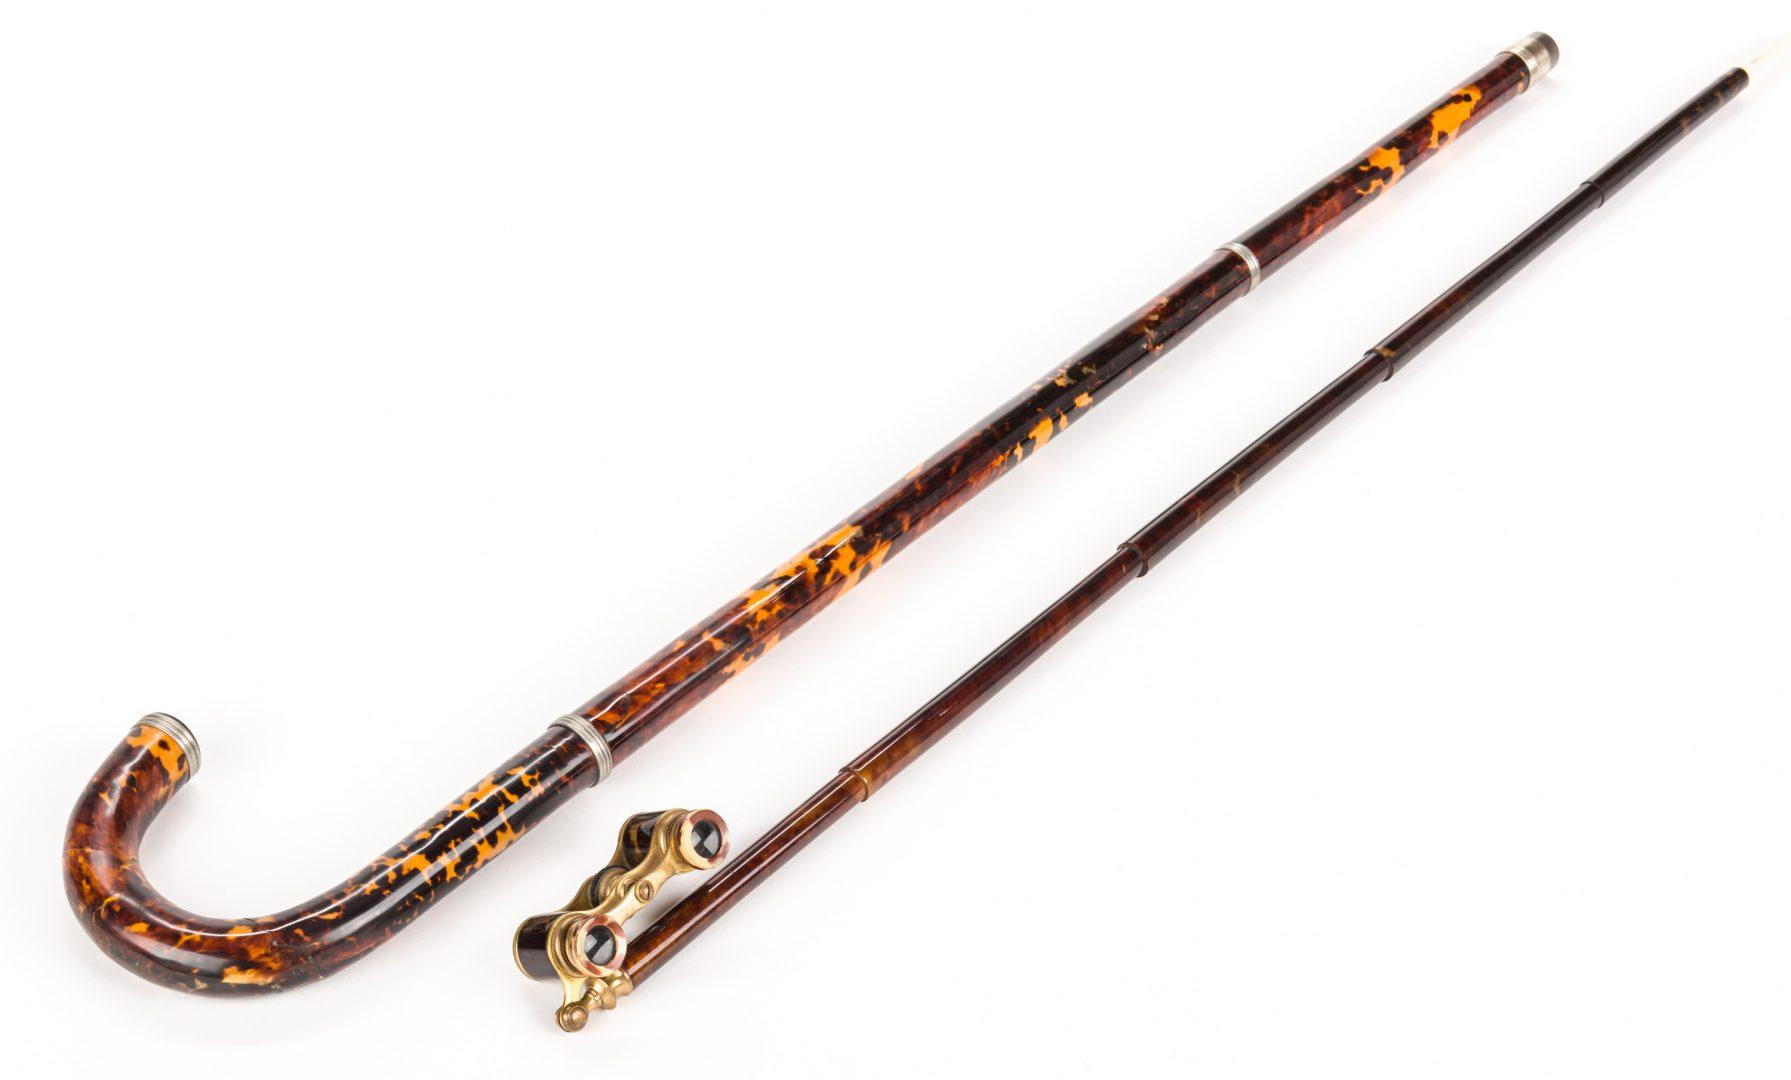 Lot 716: 2 Tortoiseshell Walking Sticks